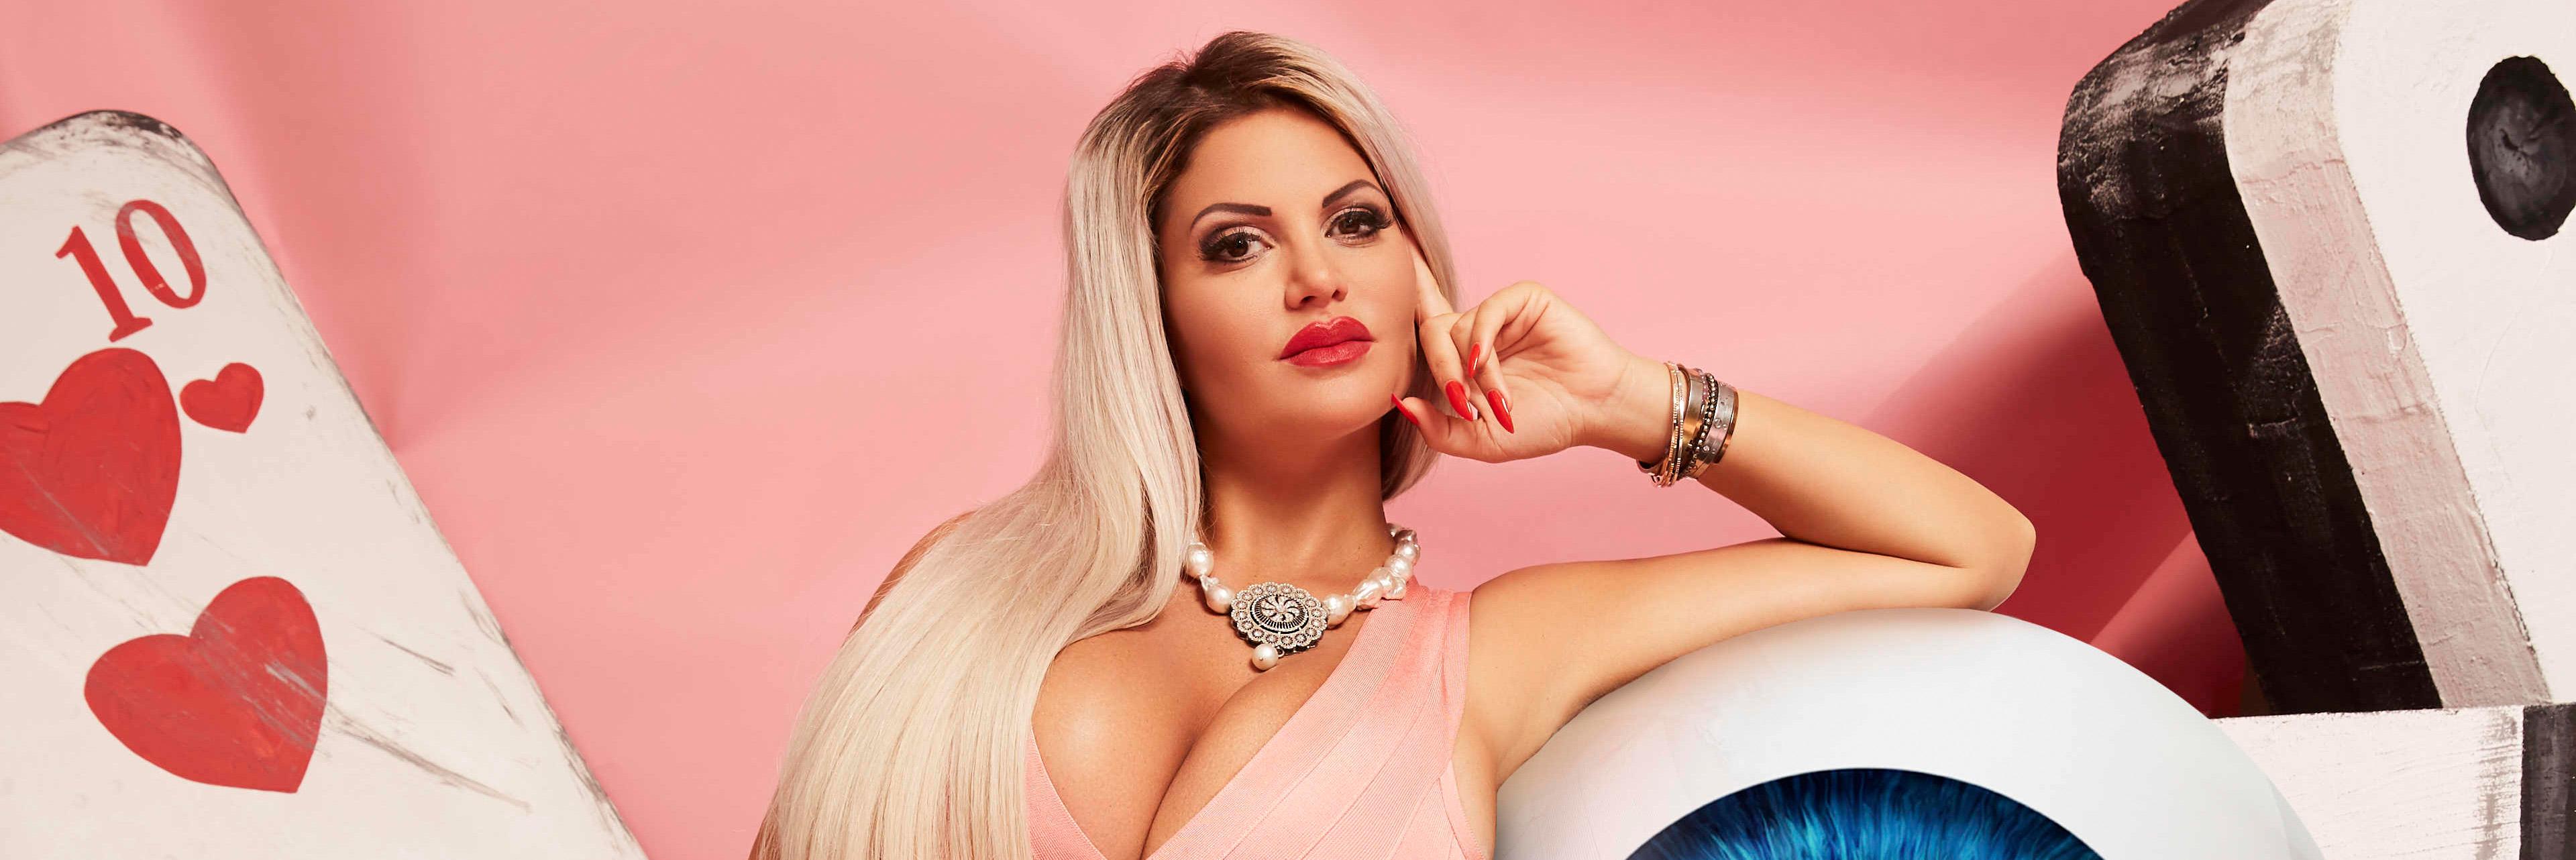 Sophia Vegas Promi Big Brother 2018